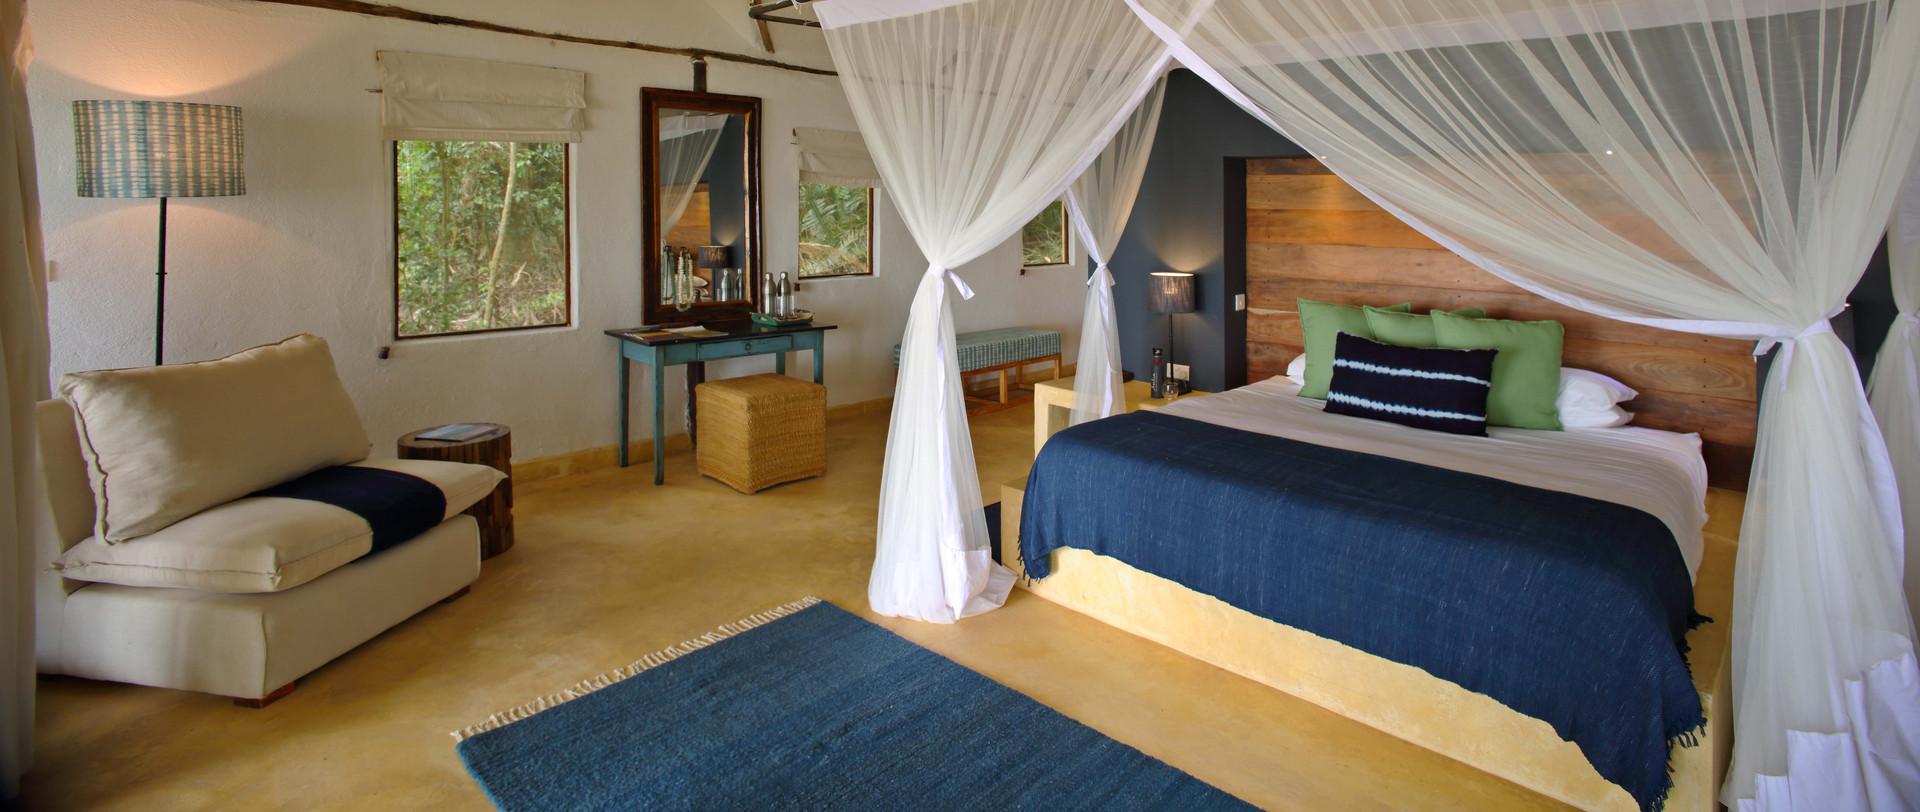 Cottage Interior Rubondo Island Chimp Ca